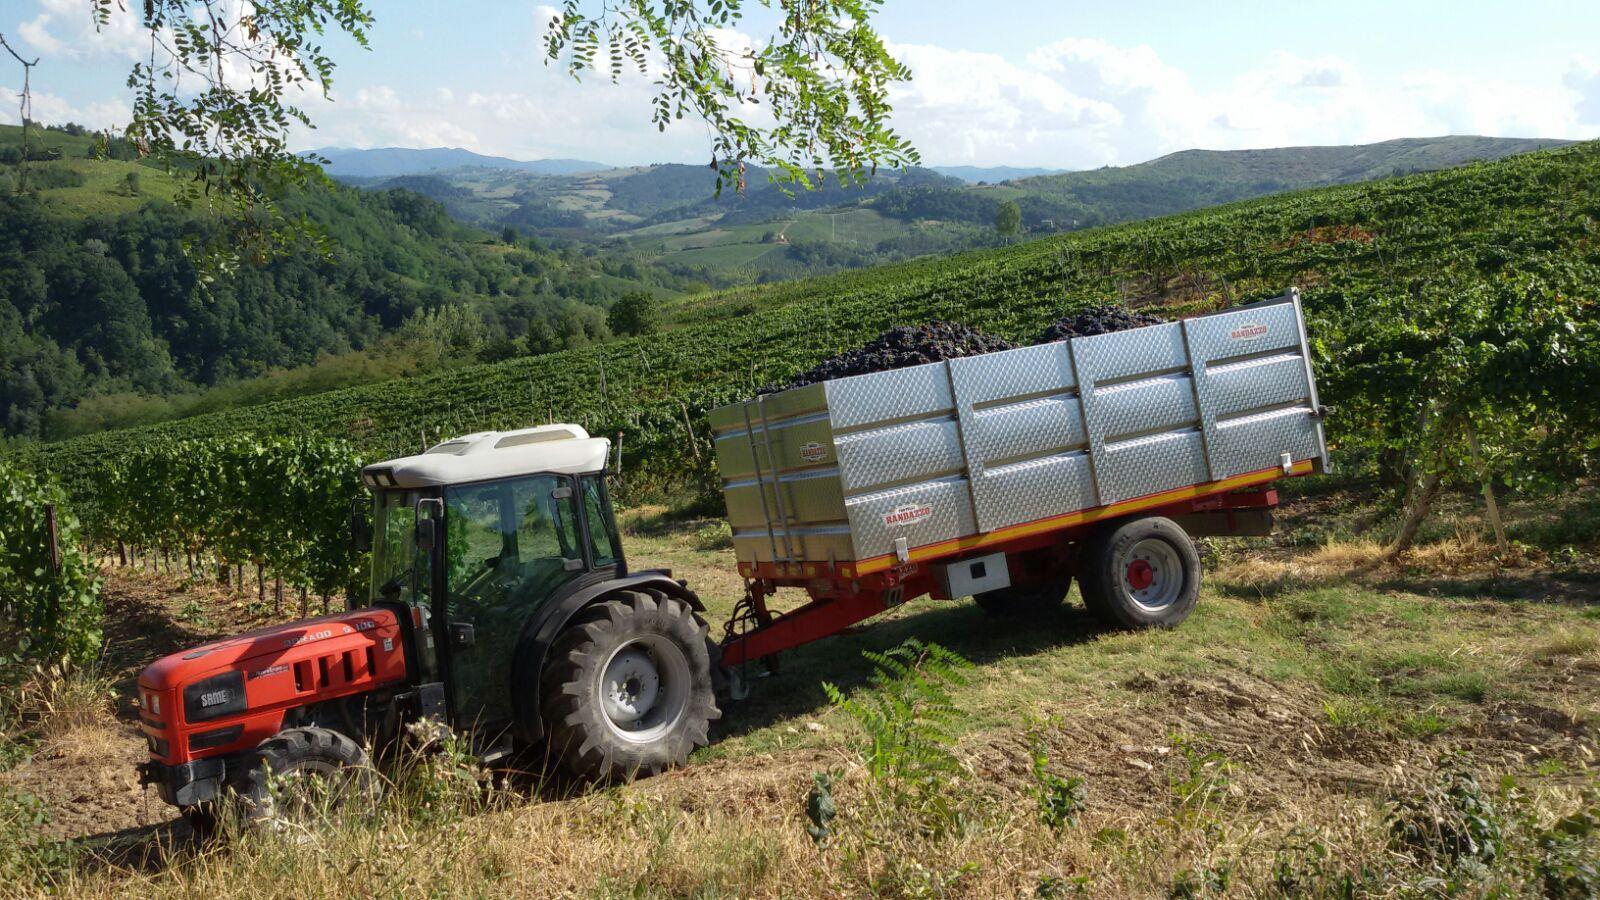 italia vigneto vitivinicoltura enografia